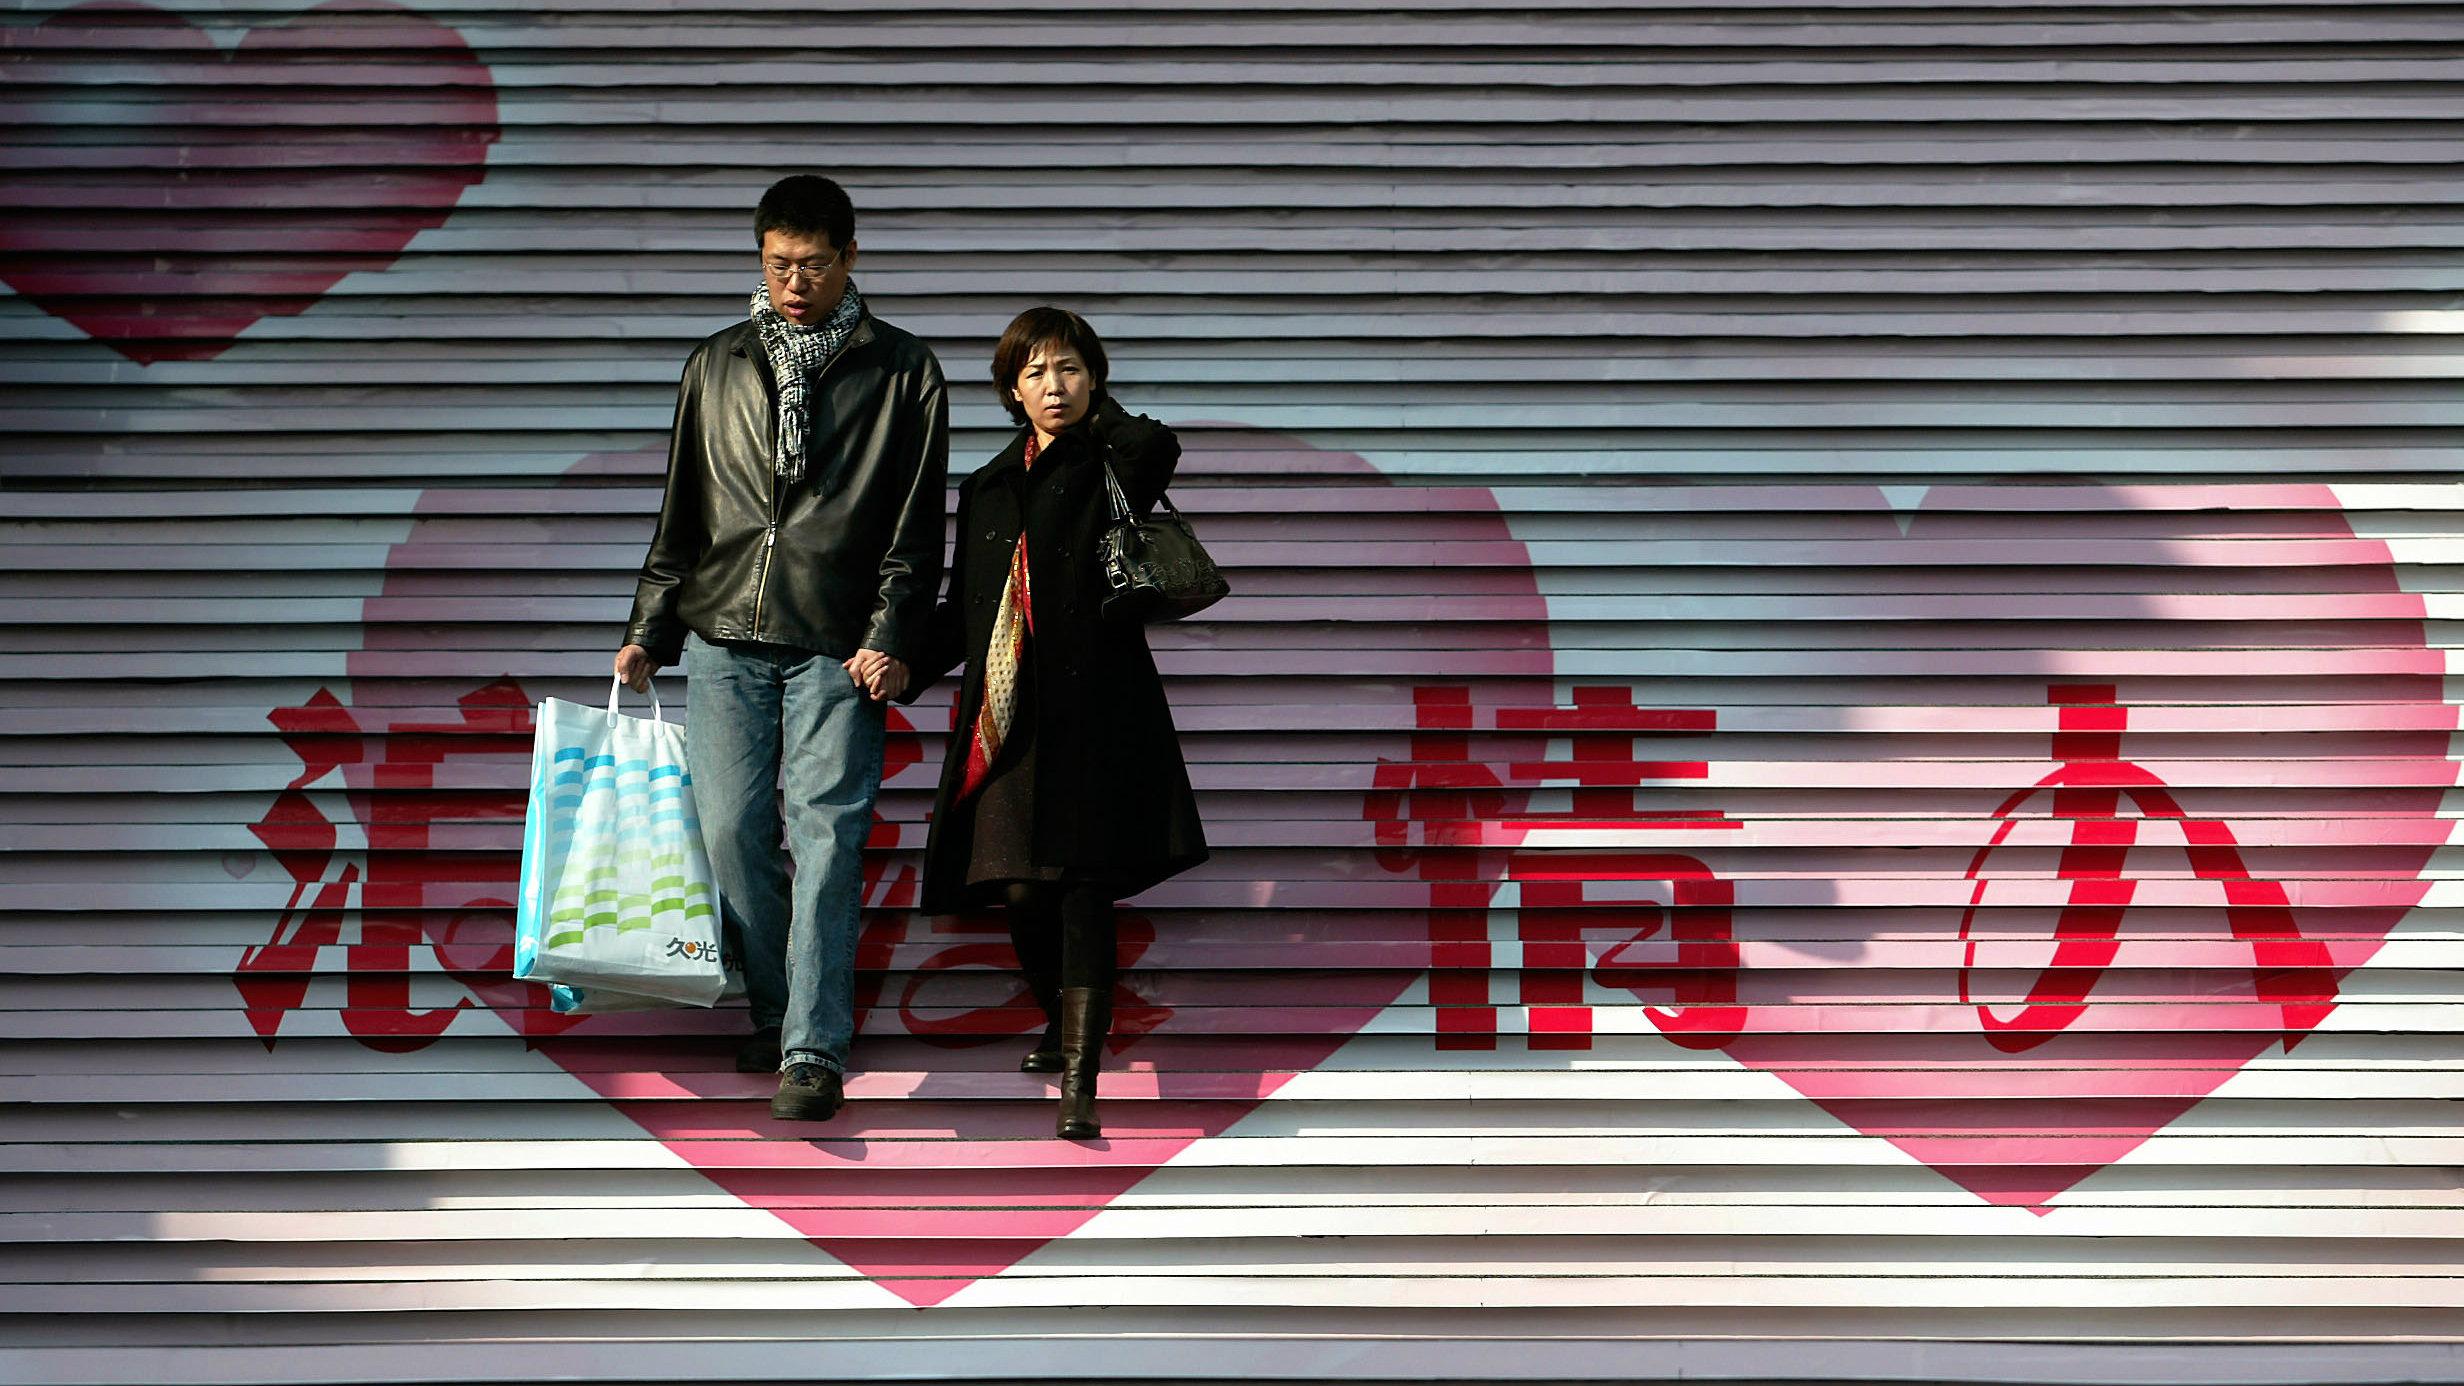 Jubei ninpucho online dating